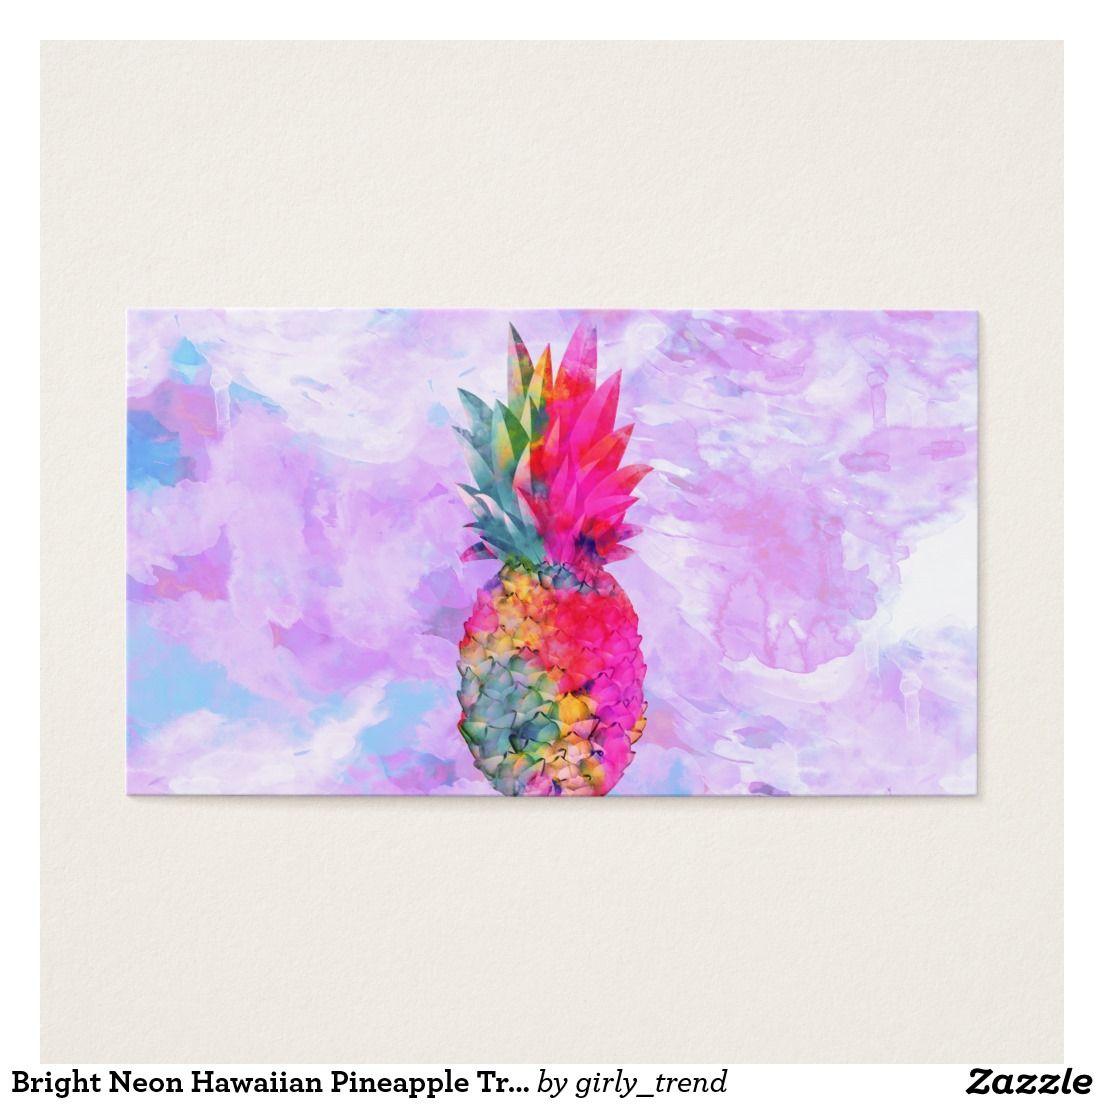 Bright Neon Hawaiian Pineapple Tropical Watercolor Business Card. a ...